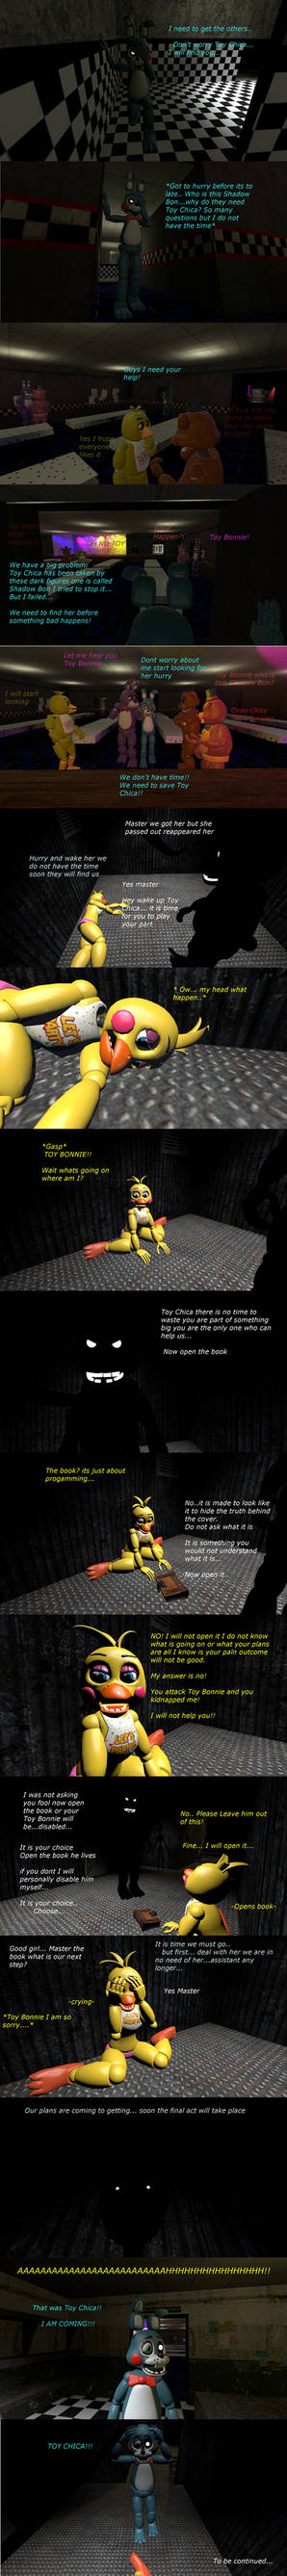 FNAF Story Page 3